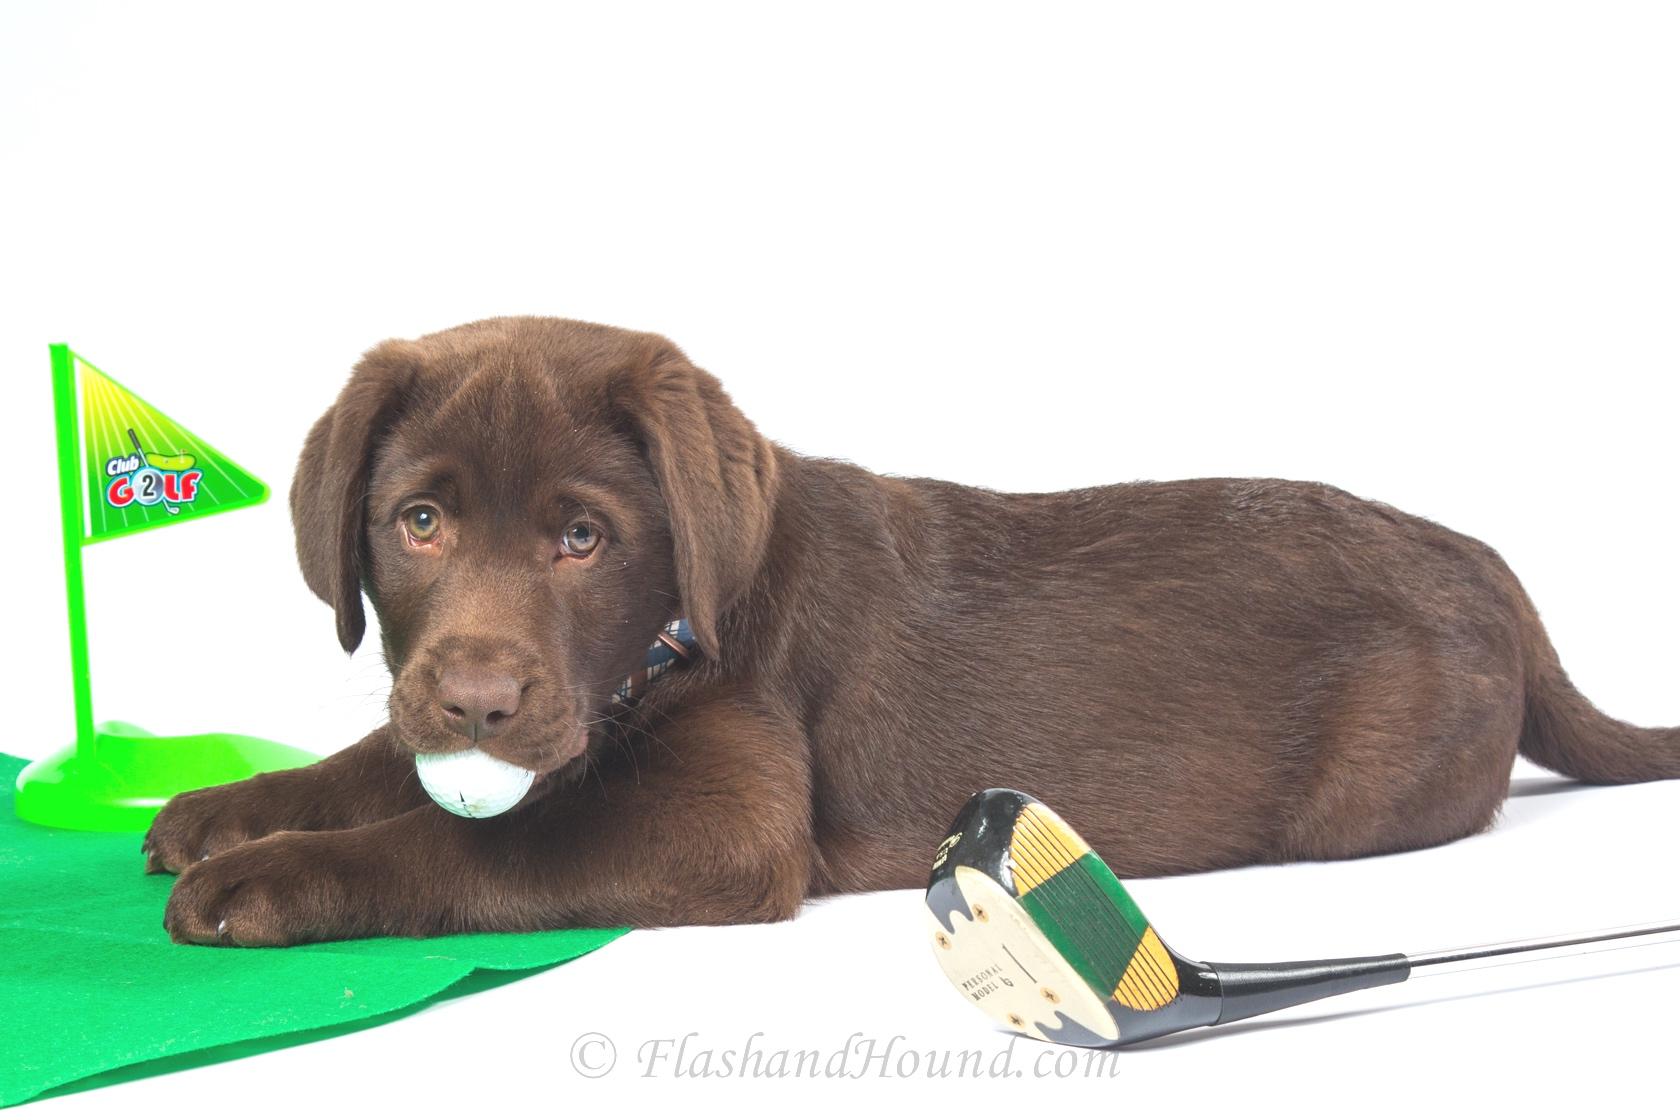 Flash and Hound chocolate lab puppy golf ball